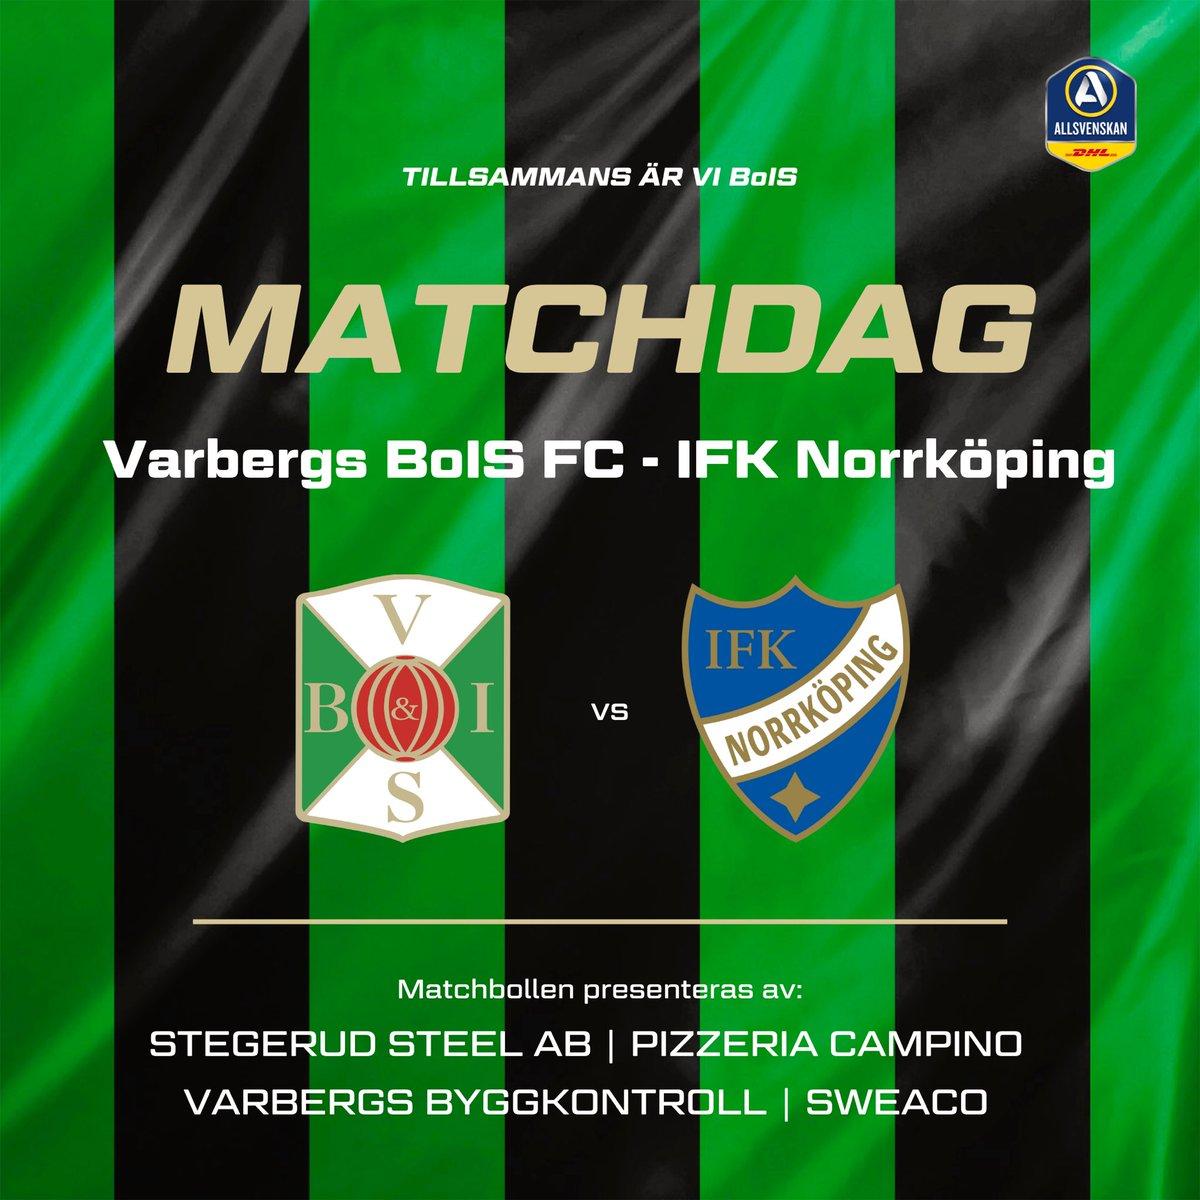 Varbergs Bois Fc Varbergsboisfc Twitter